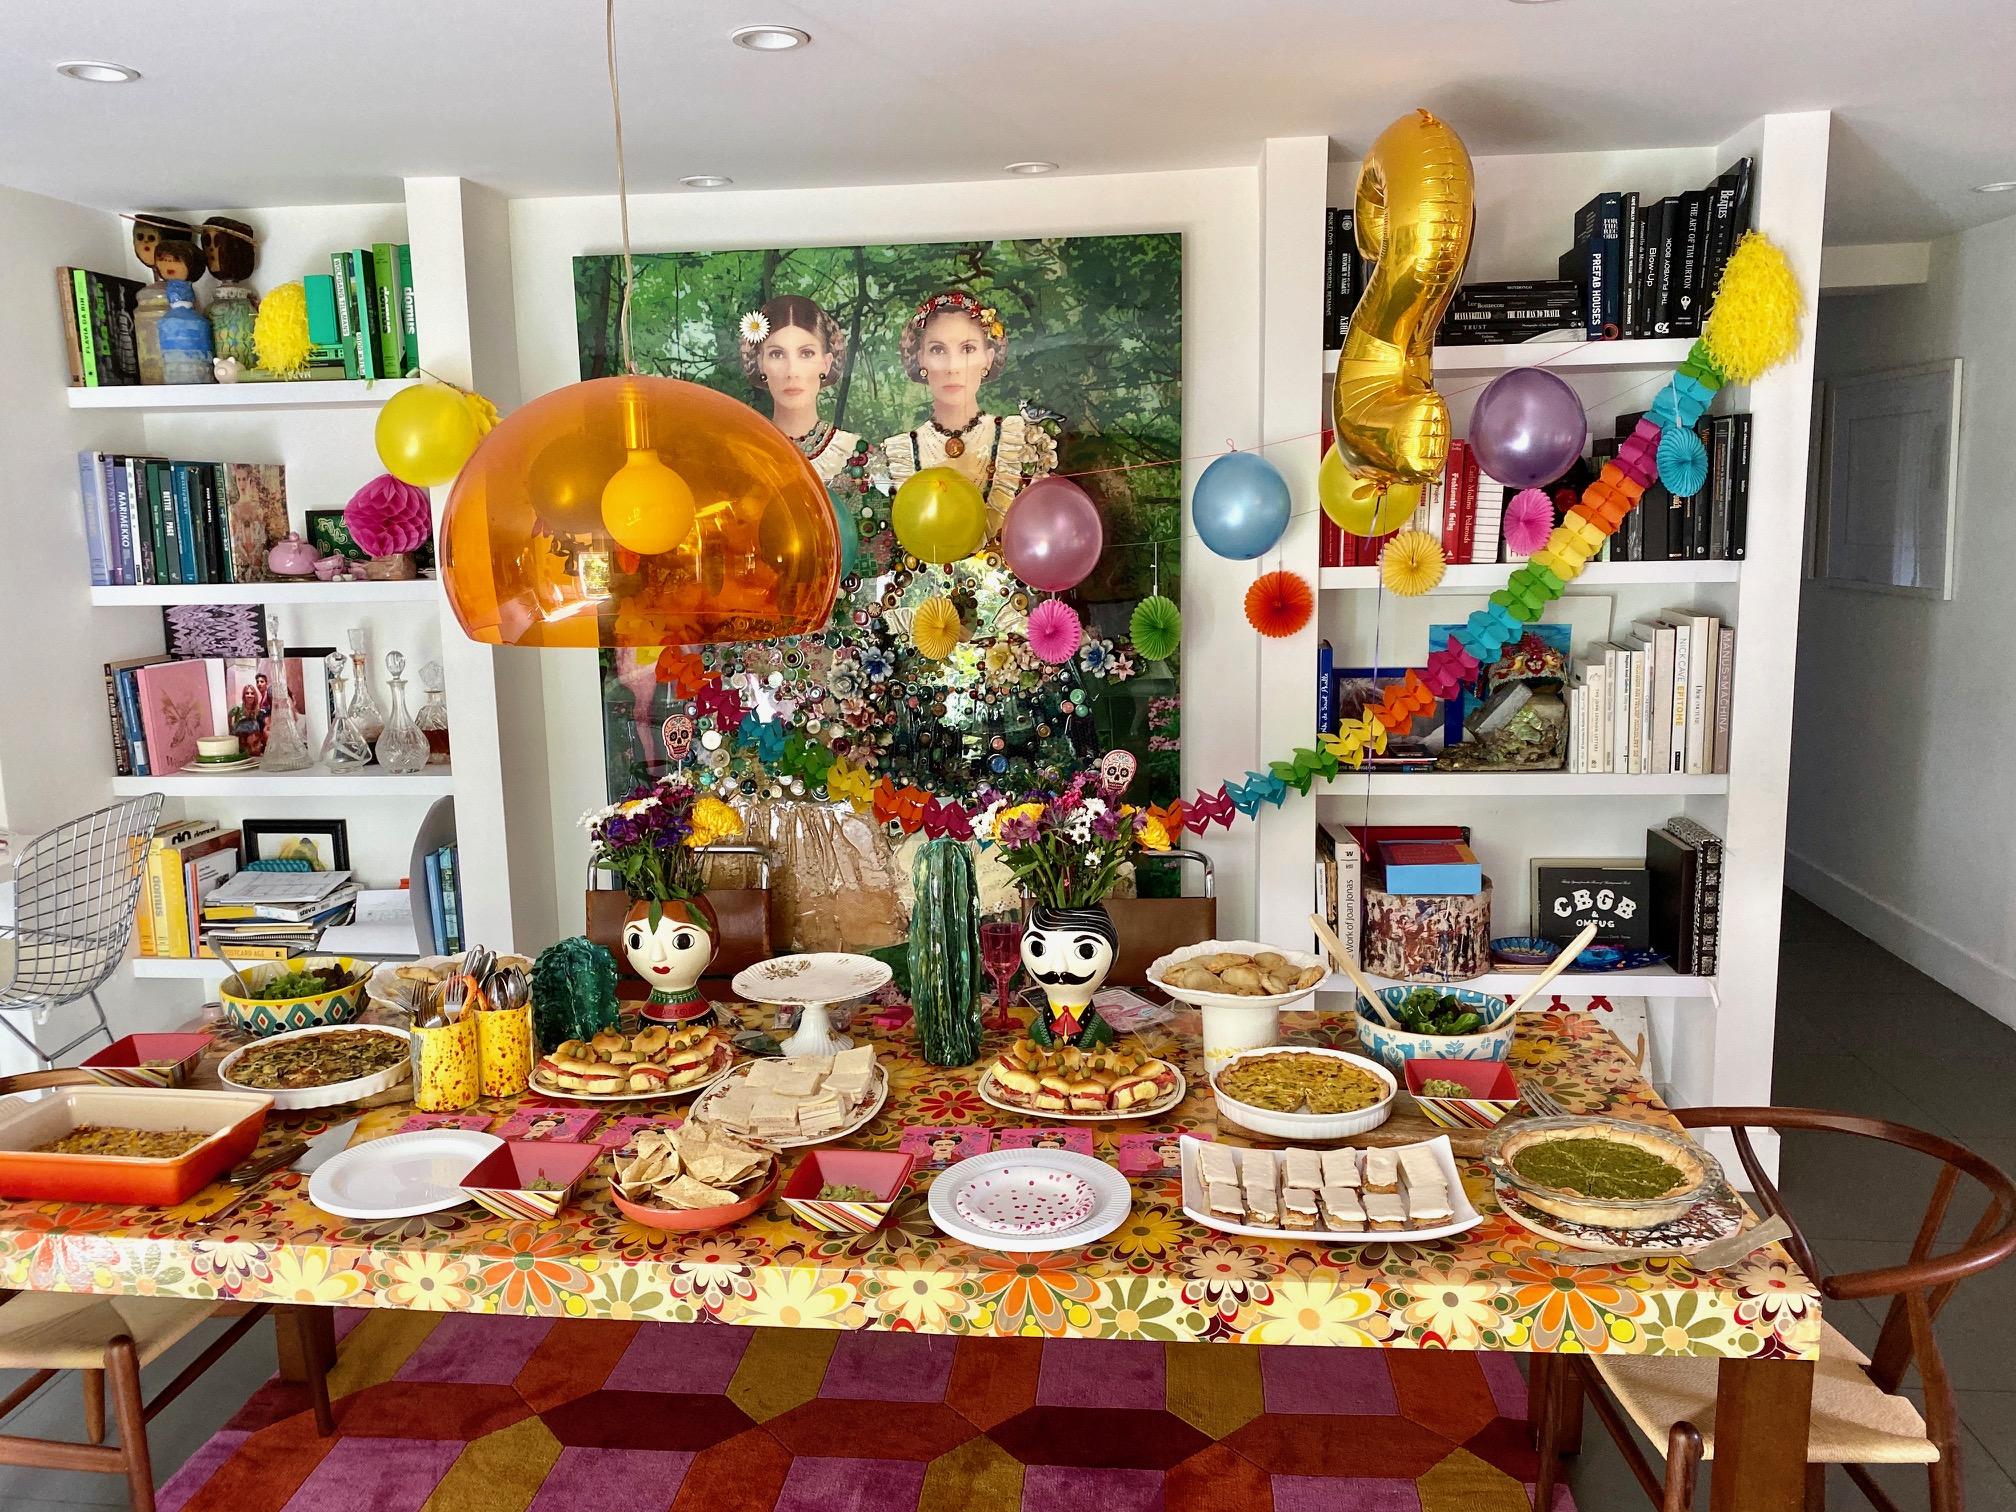 Candela Ferro y su familia, fiesta Oleta